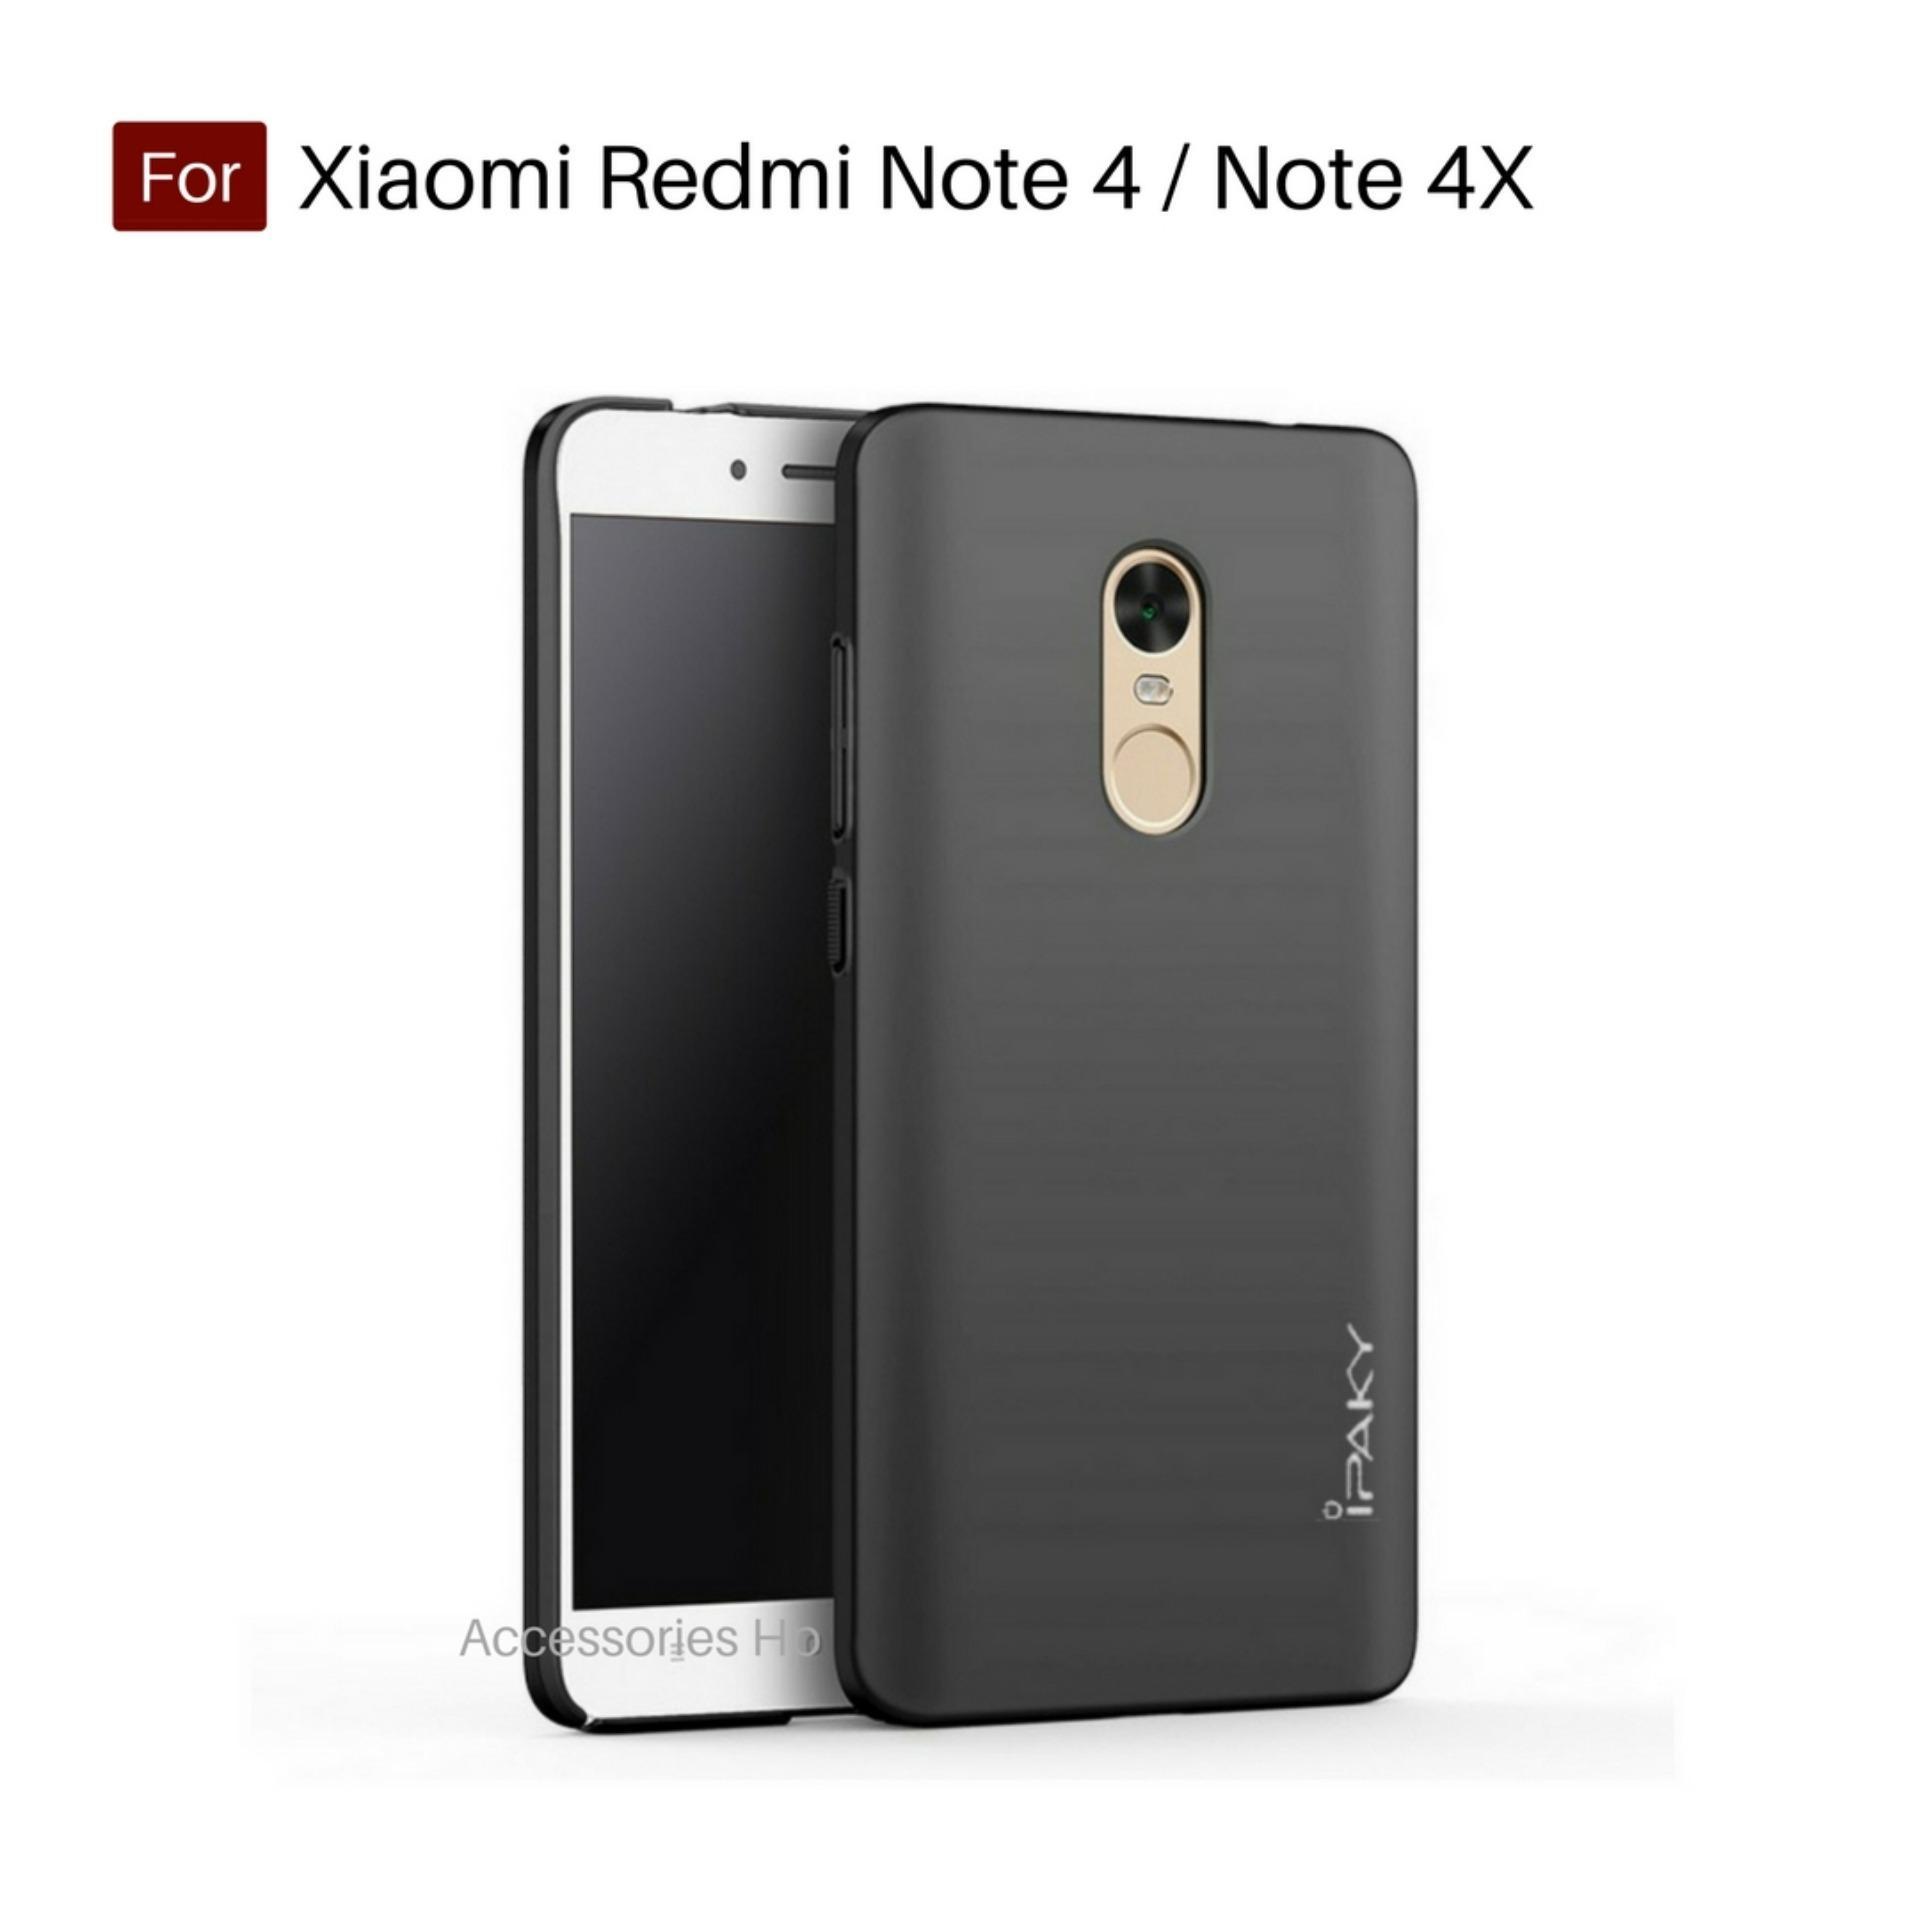 Accessories Hp iPaky Super Slim Matte Anti Fingerprint Hybrid Case For Xiaomi Redmi Note 4 / Note 4X Versi Mediatek 5.5 inch - Black